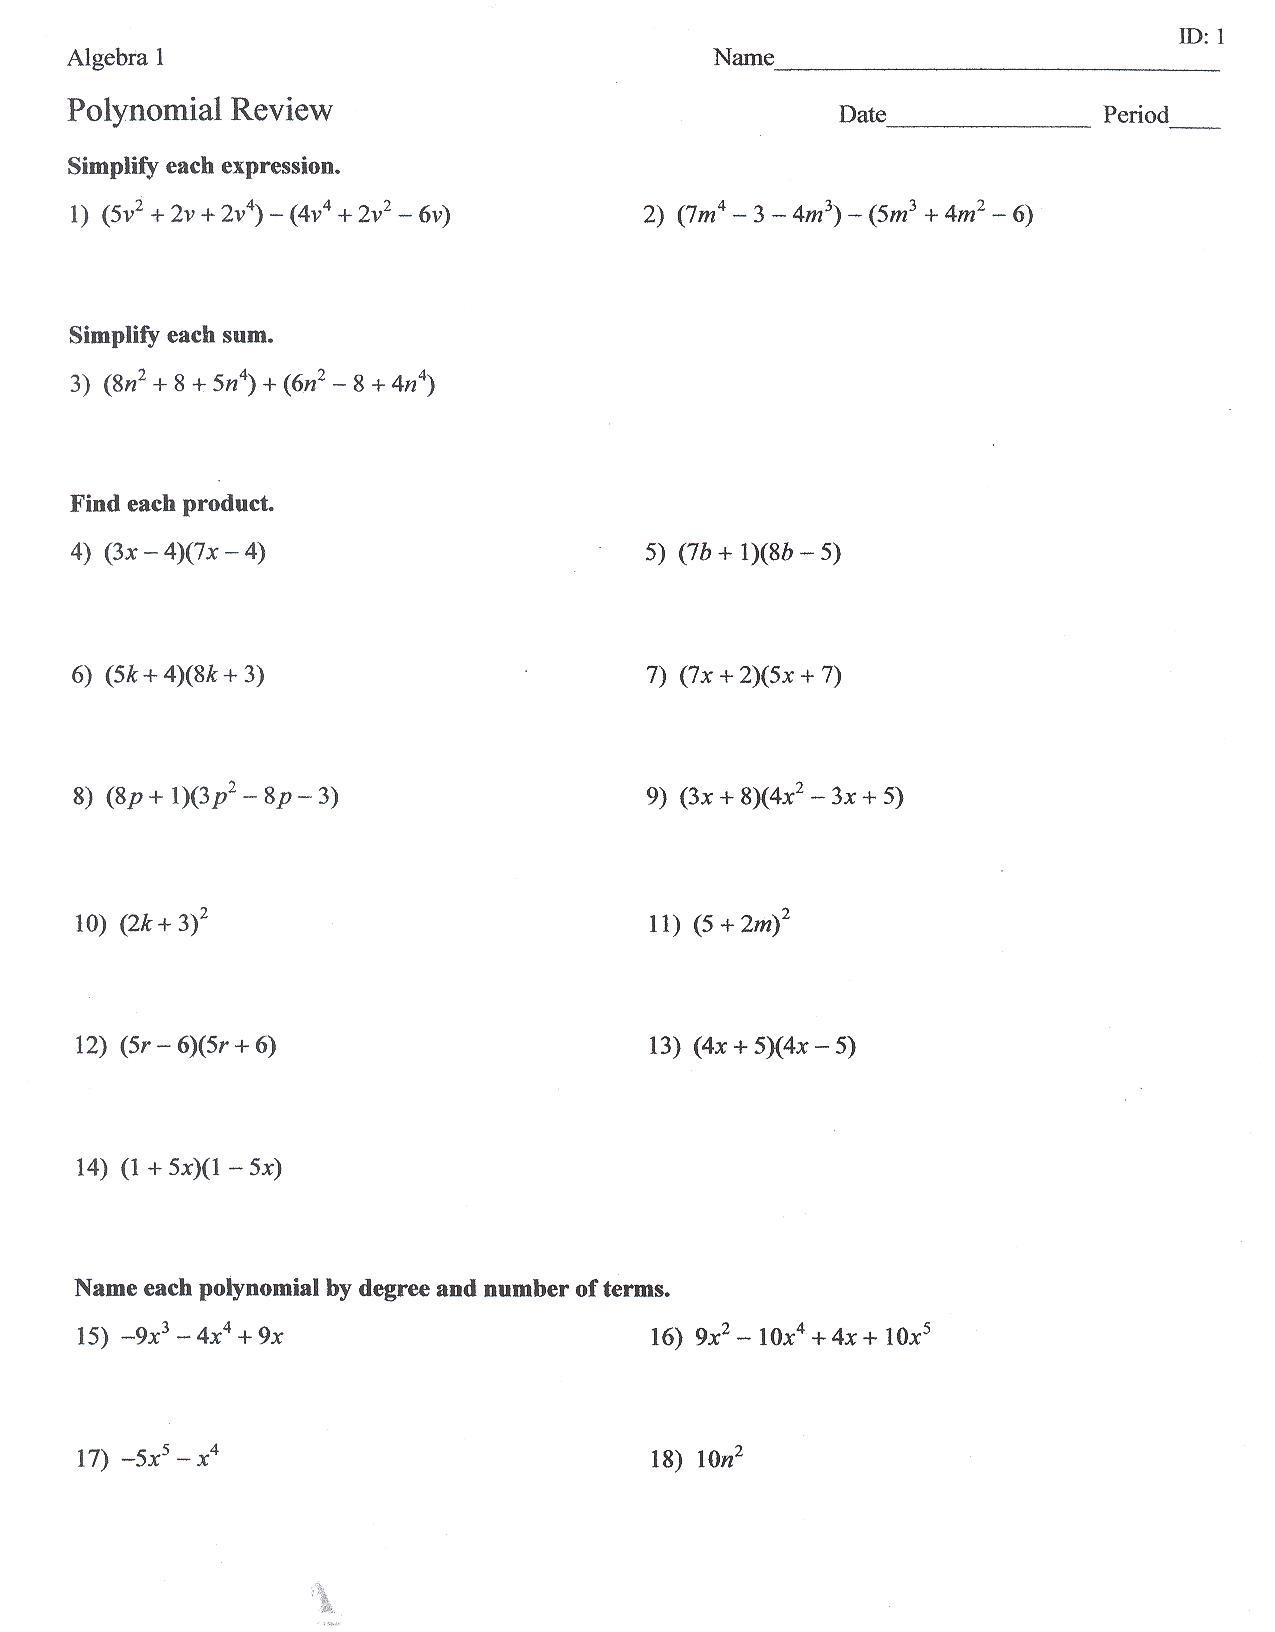 Algebra 2 Factoring Review Worksheet Answers